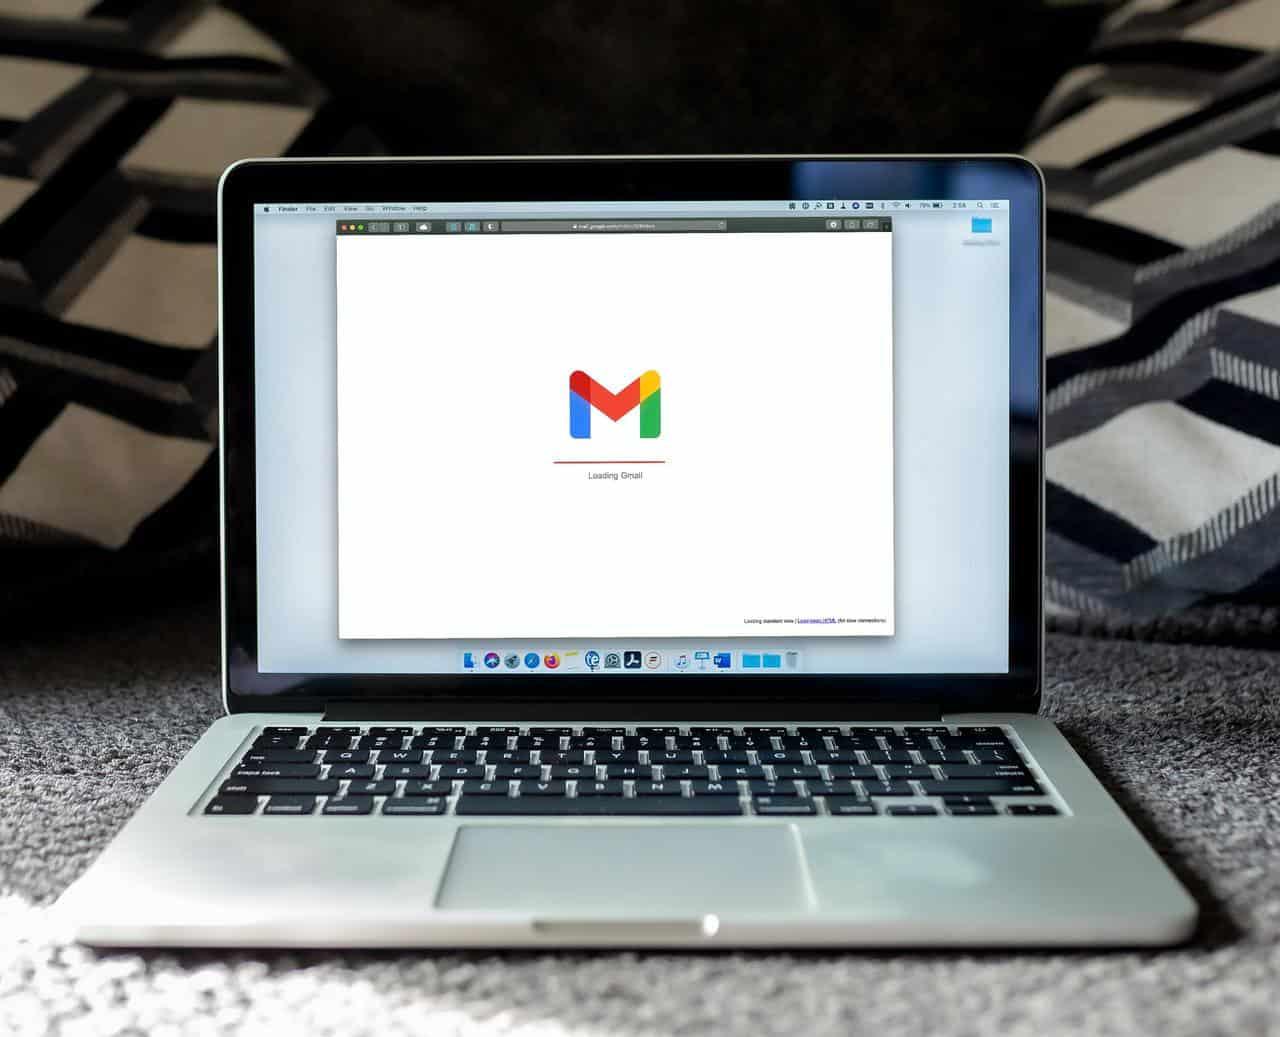 Gmail loading screen on laptop